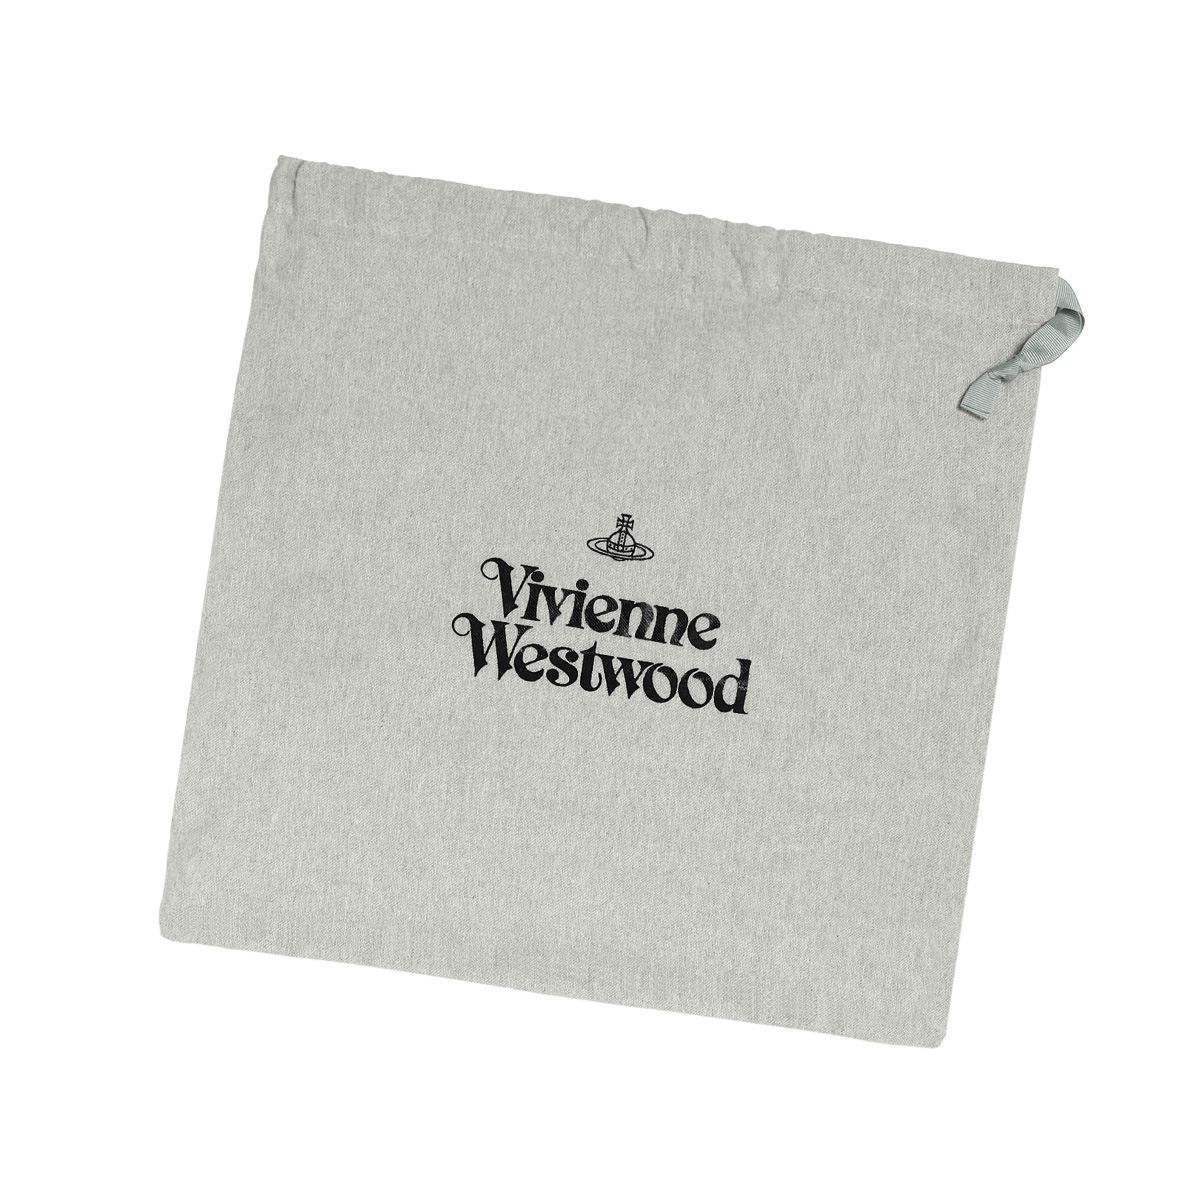 VIVIENNE WESTWOOD ヴィヴィアン ウエストウッド | ショルダー付 ハンドバッグ | JOHANNA ジョアンナ